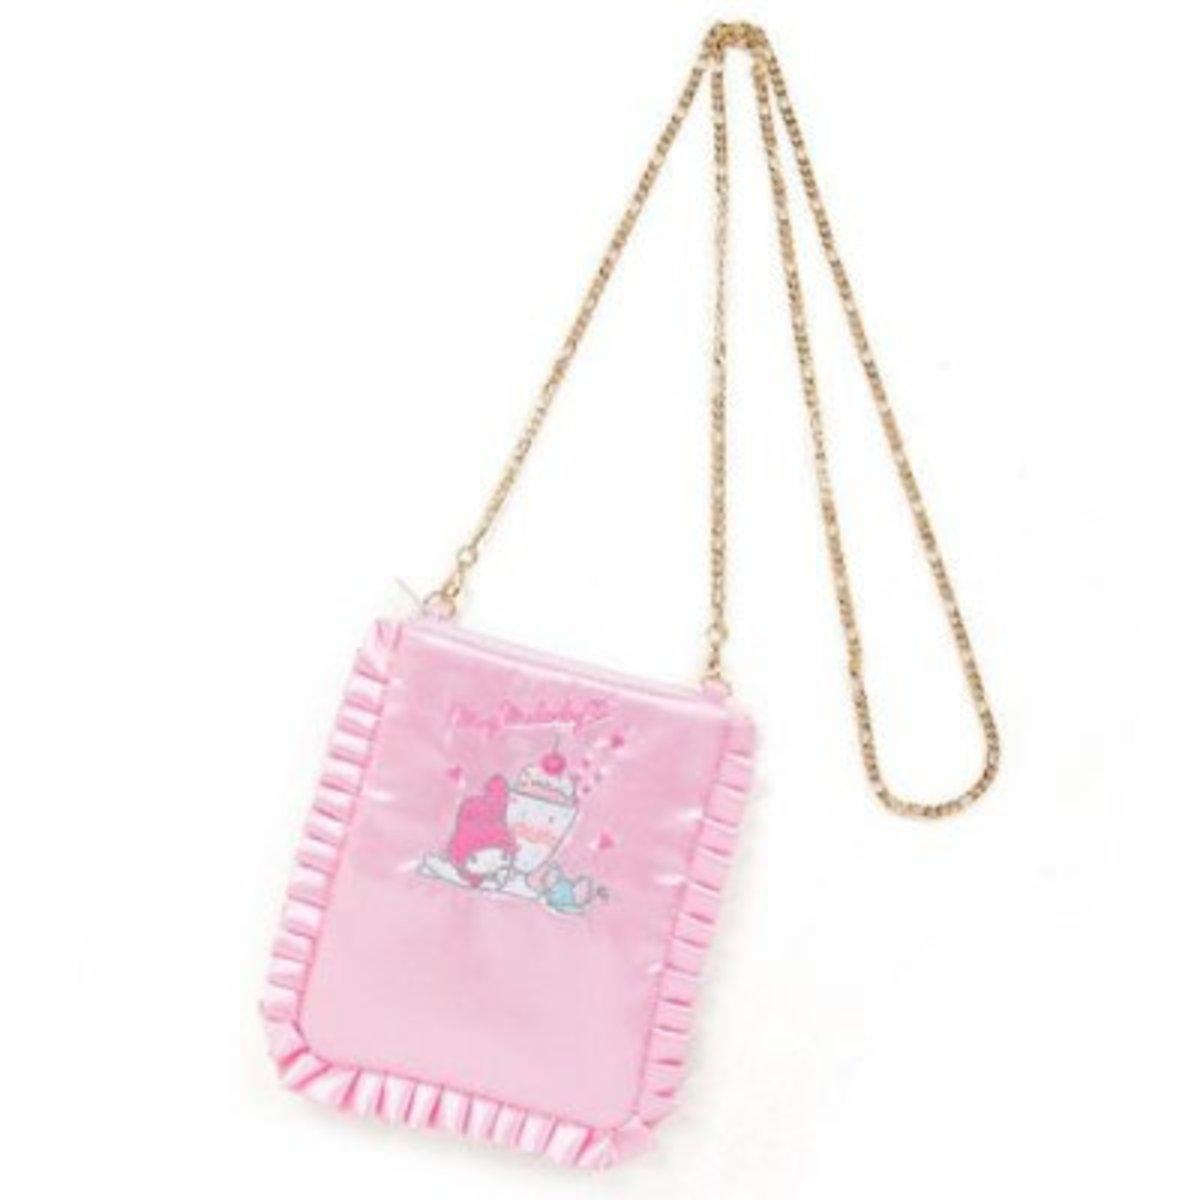 (My Melody) Japan Sanrio Shoulder Bag w/ Chain Strap